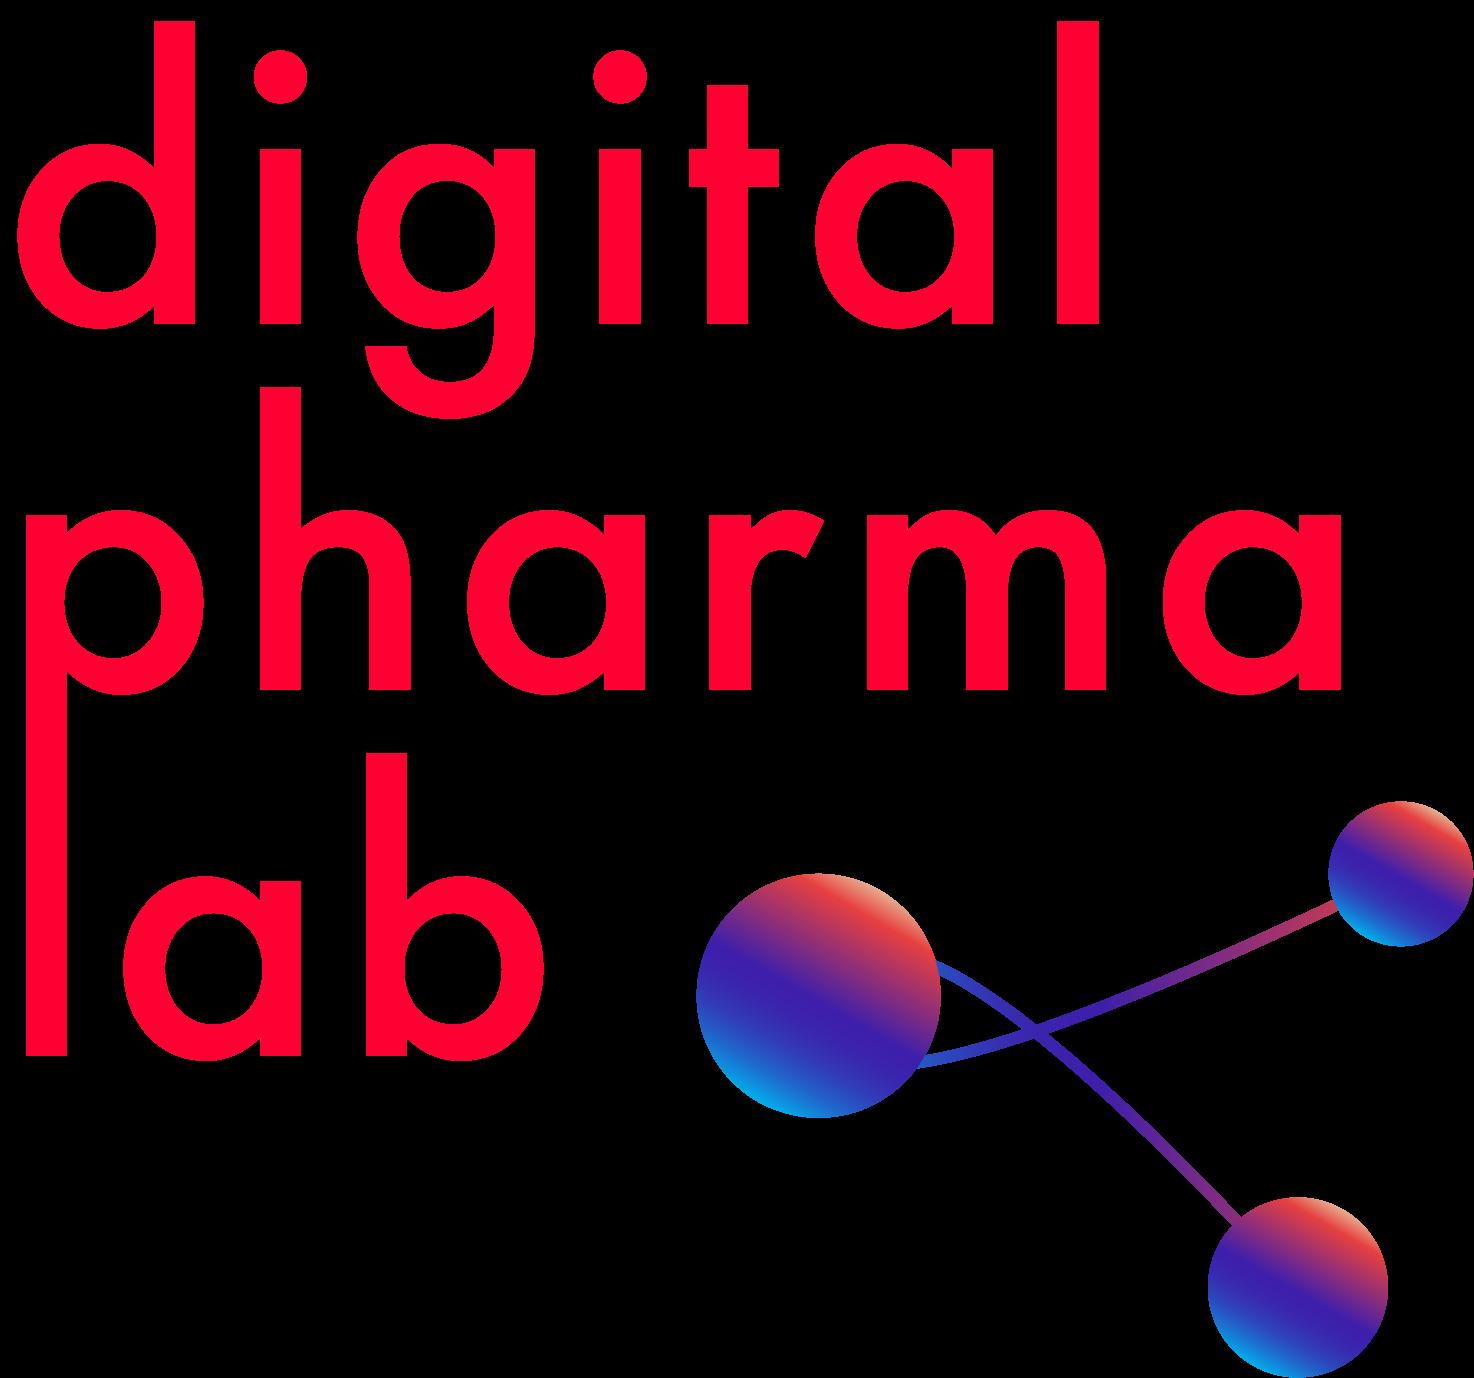 Digital Pharma Lab